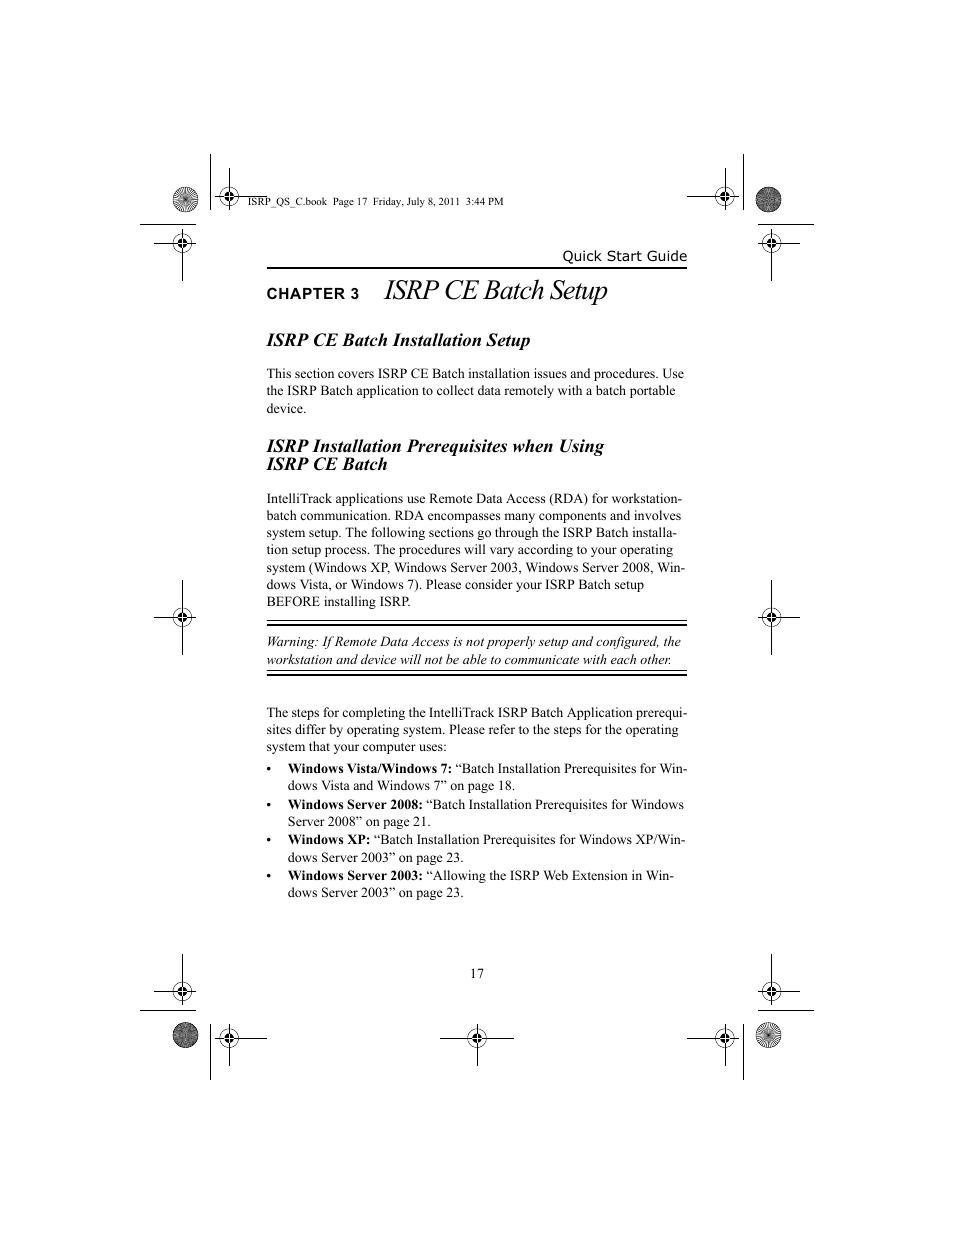 Chapter 3 isrp ce batch setup, Isrp ce batch installation